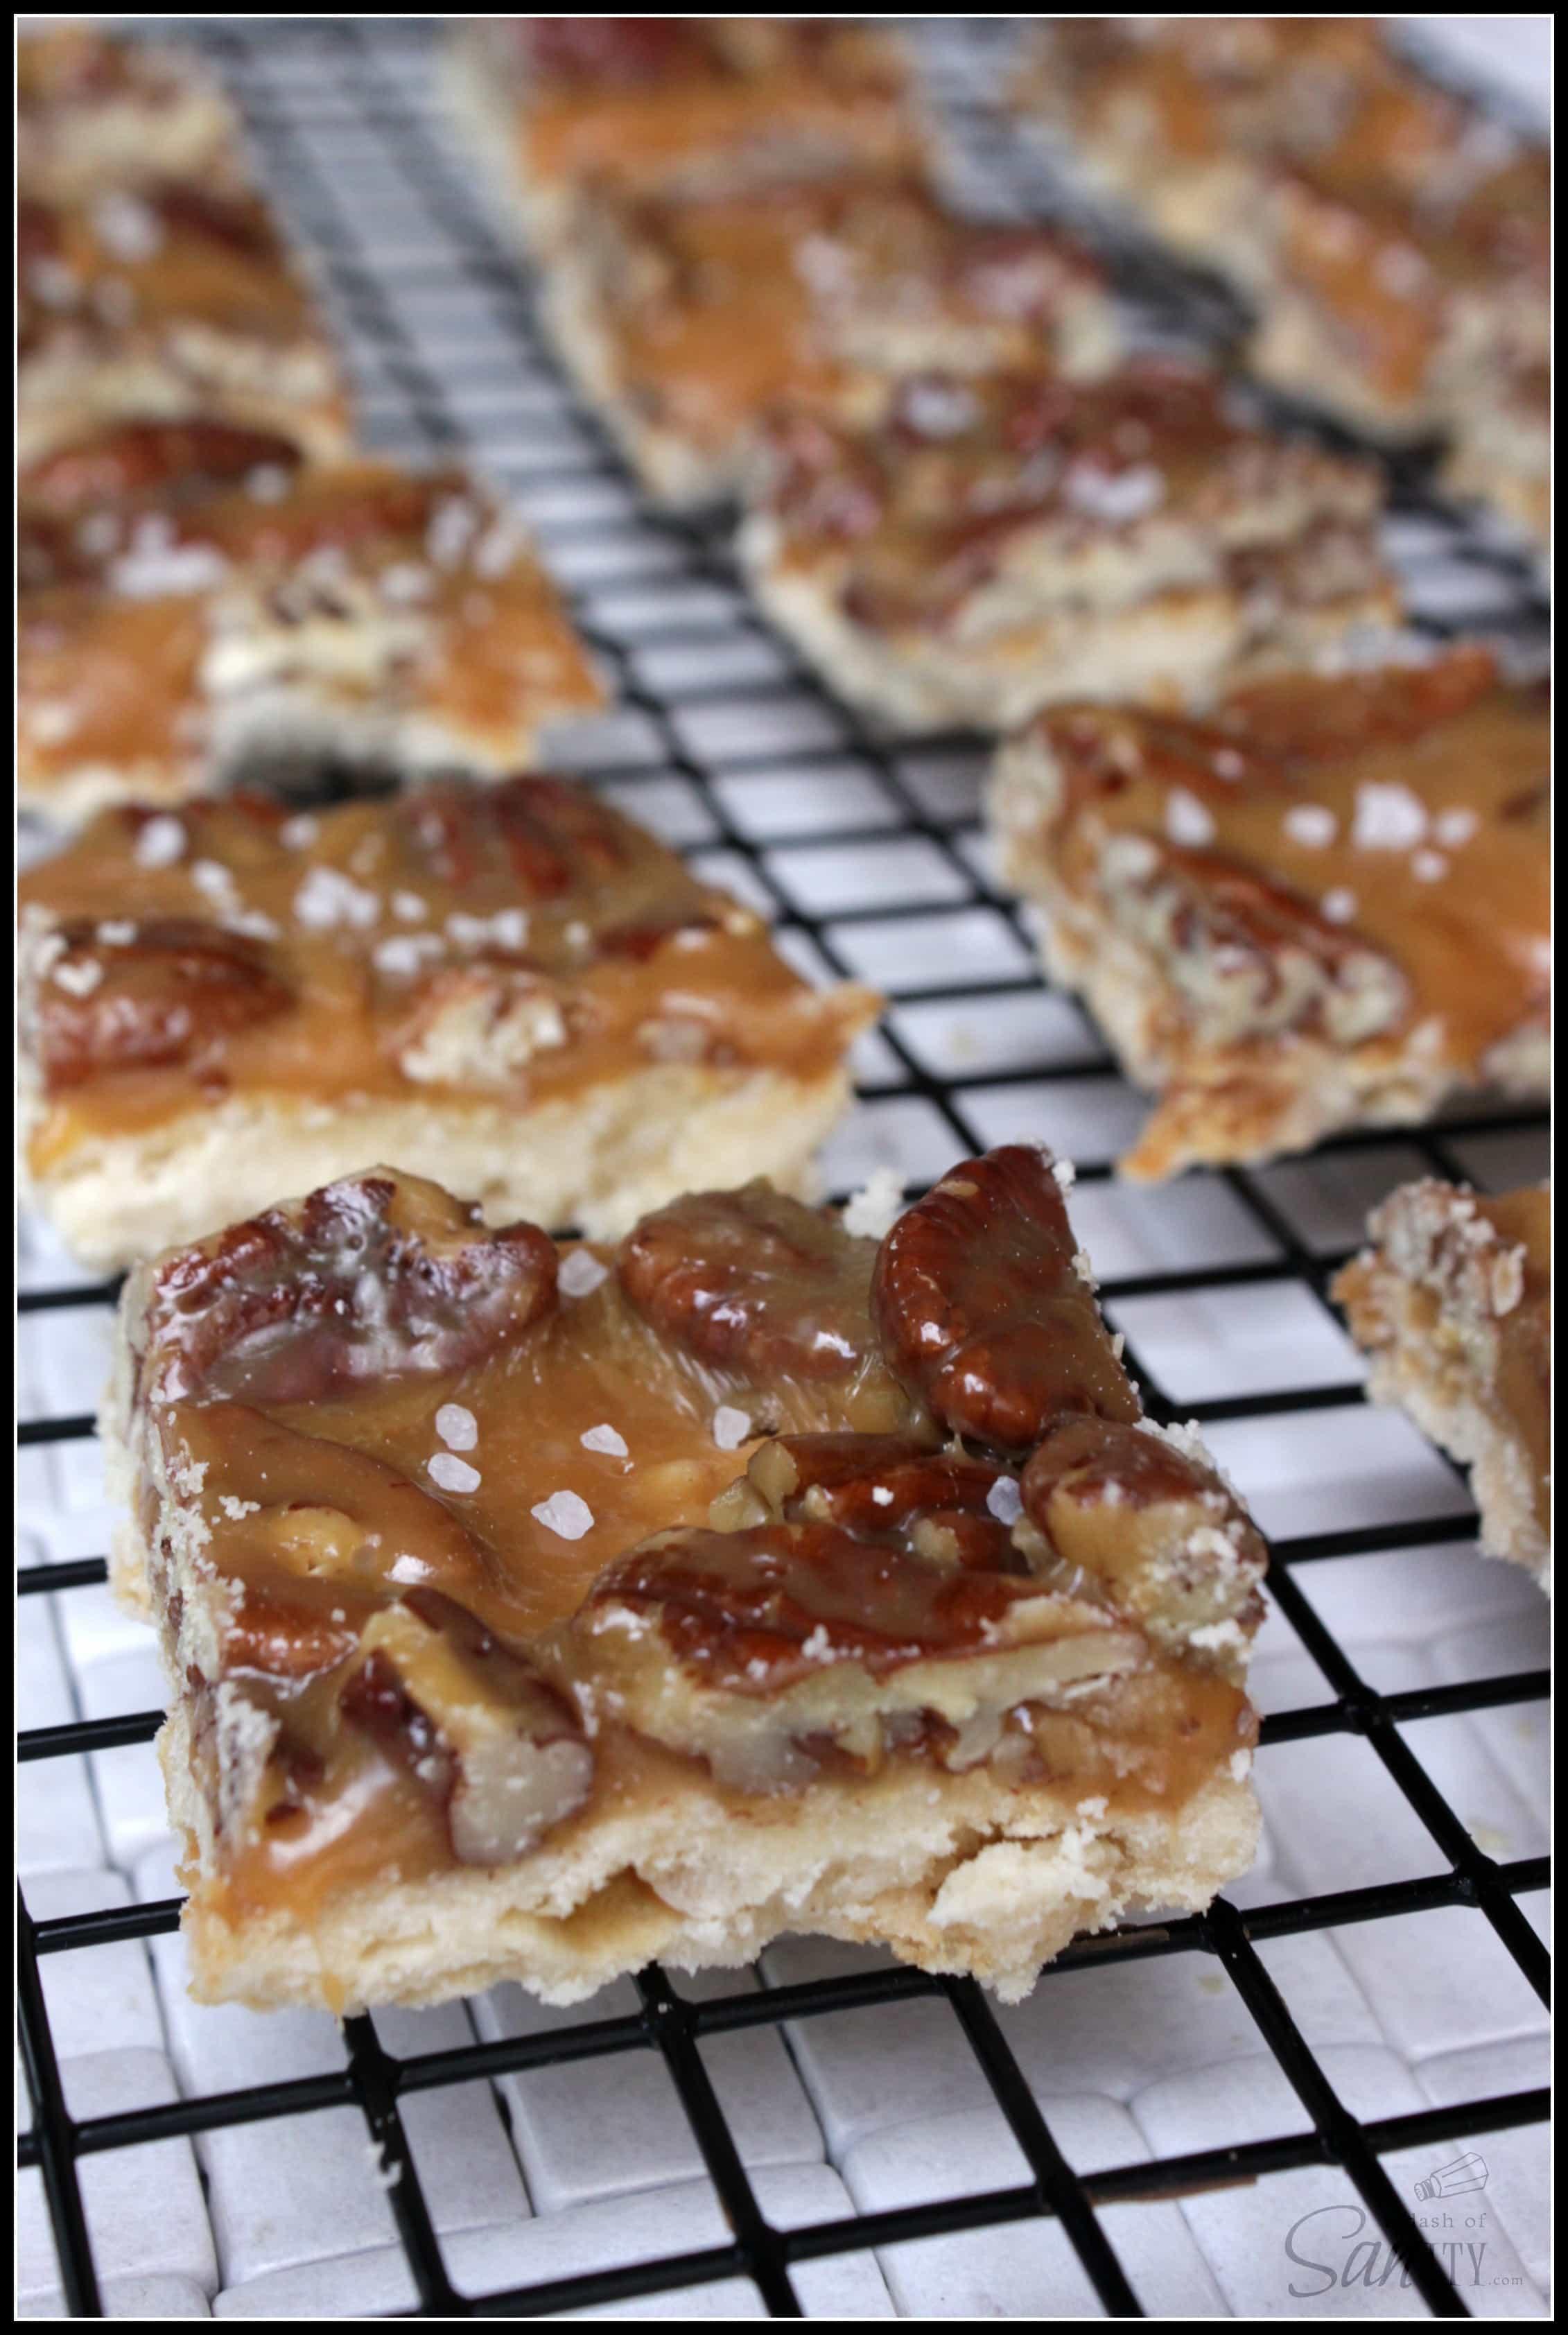 http://www.adashofsanity.com/2014/03/caramel-pecan-shortbread-bars/